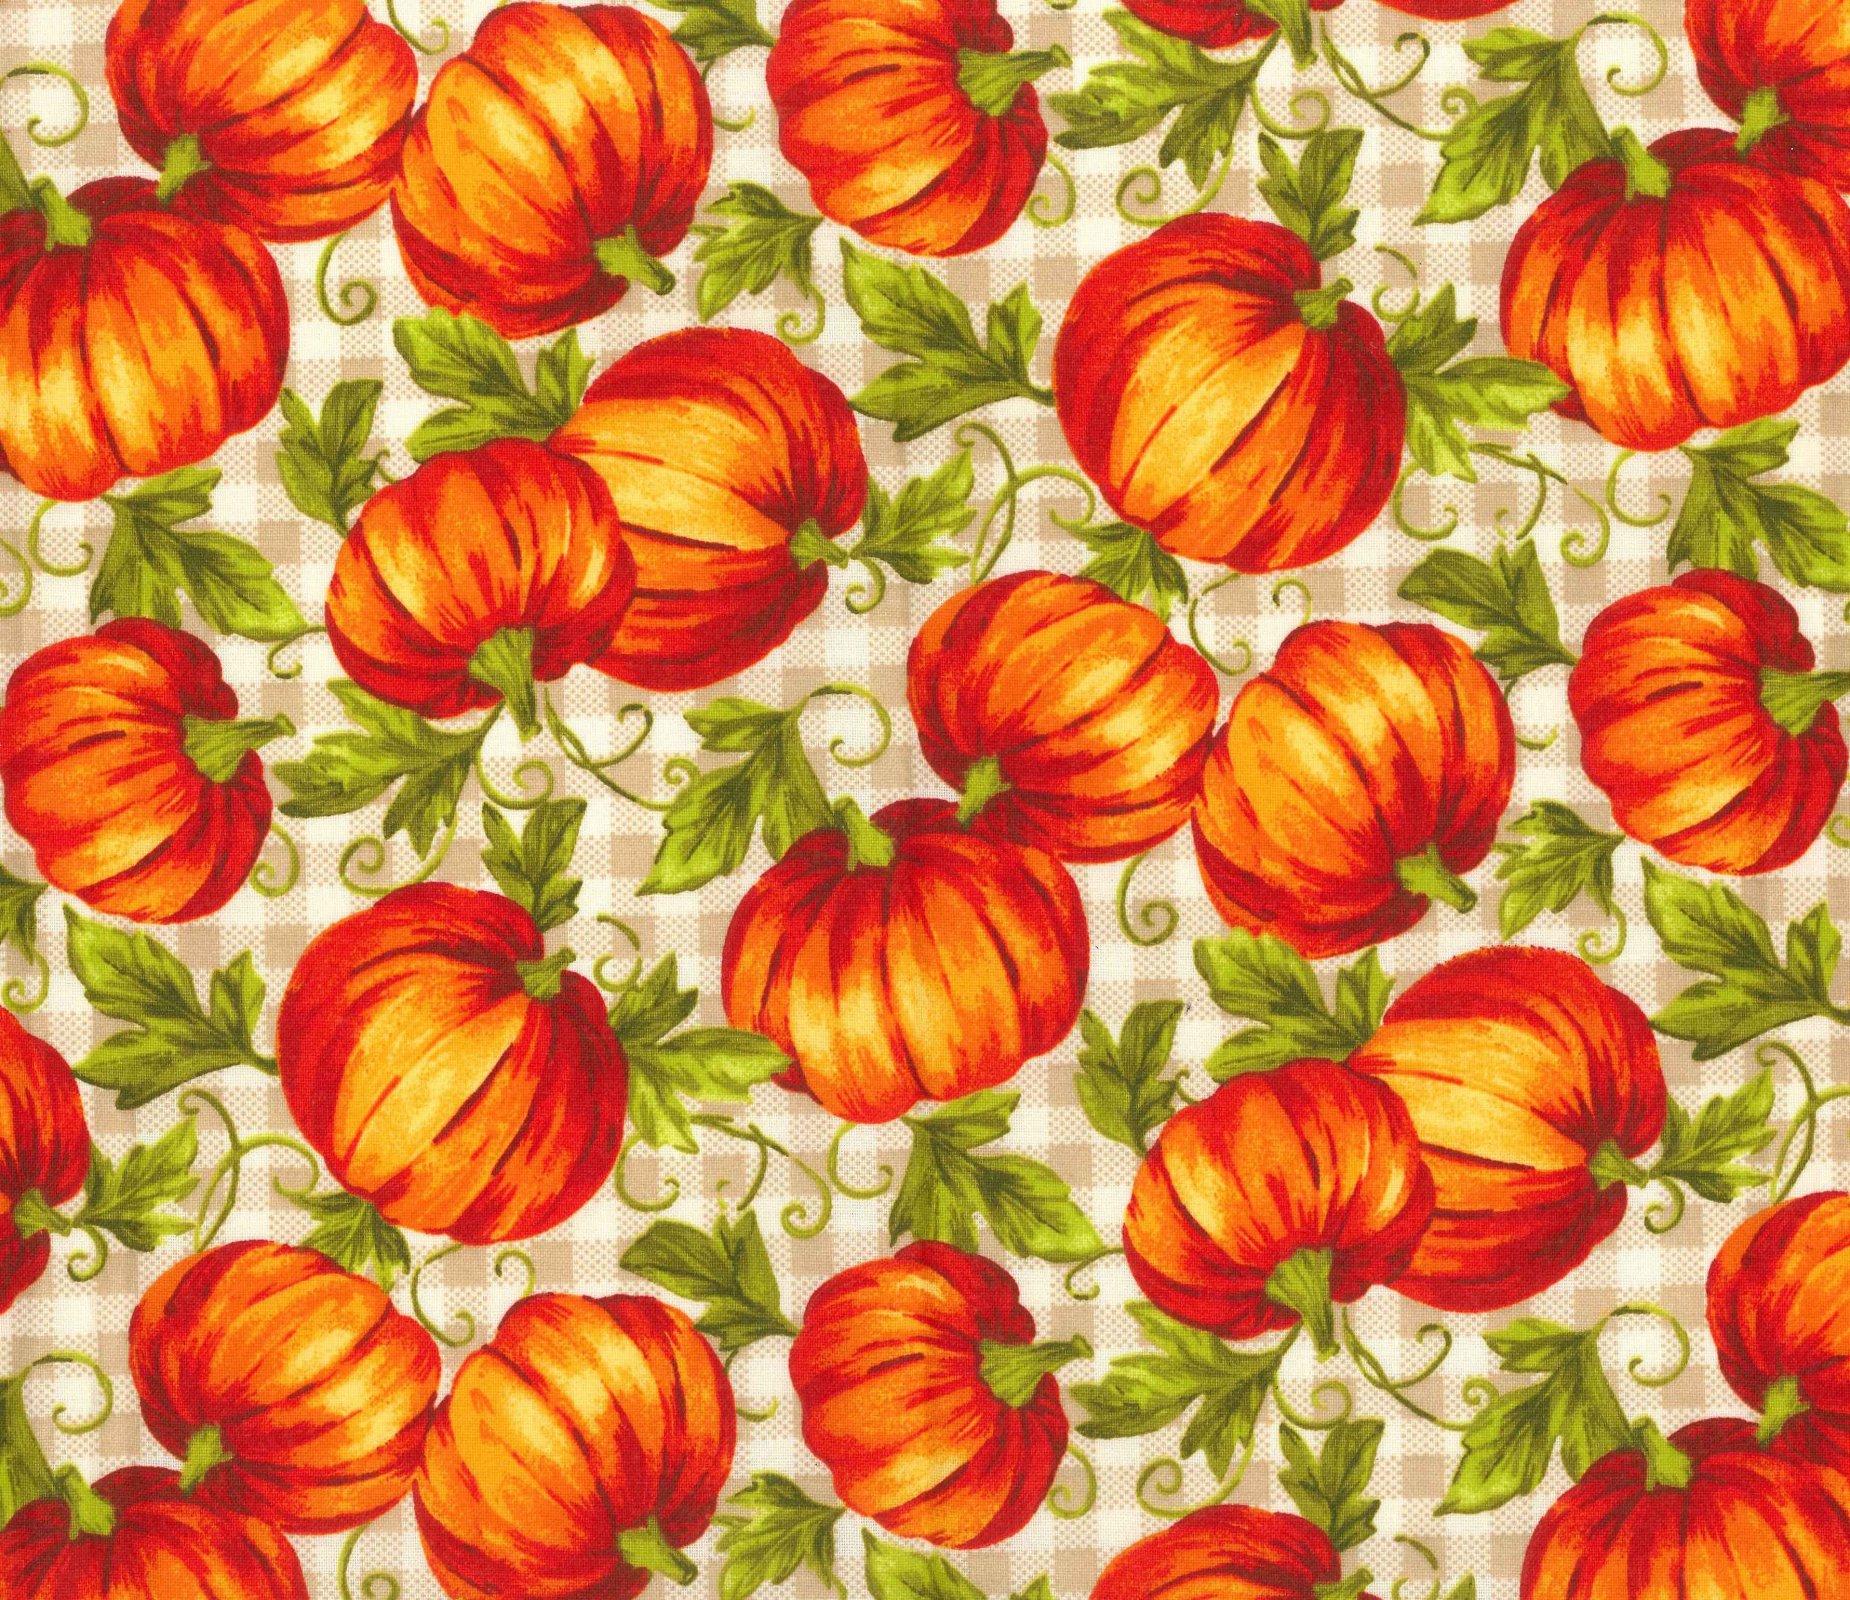 FT-Fall Holidays 17818-C Leafy Pumpkins